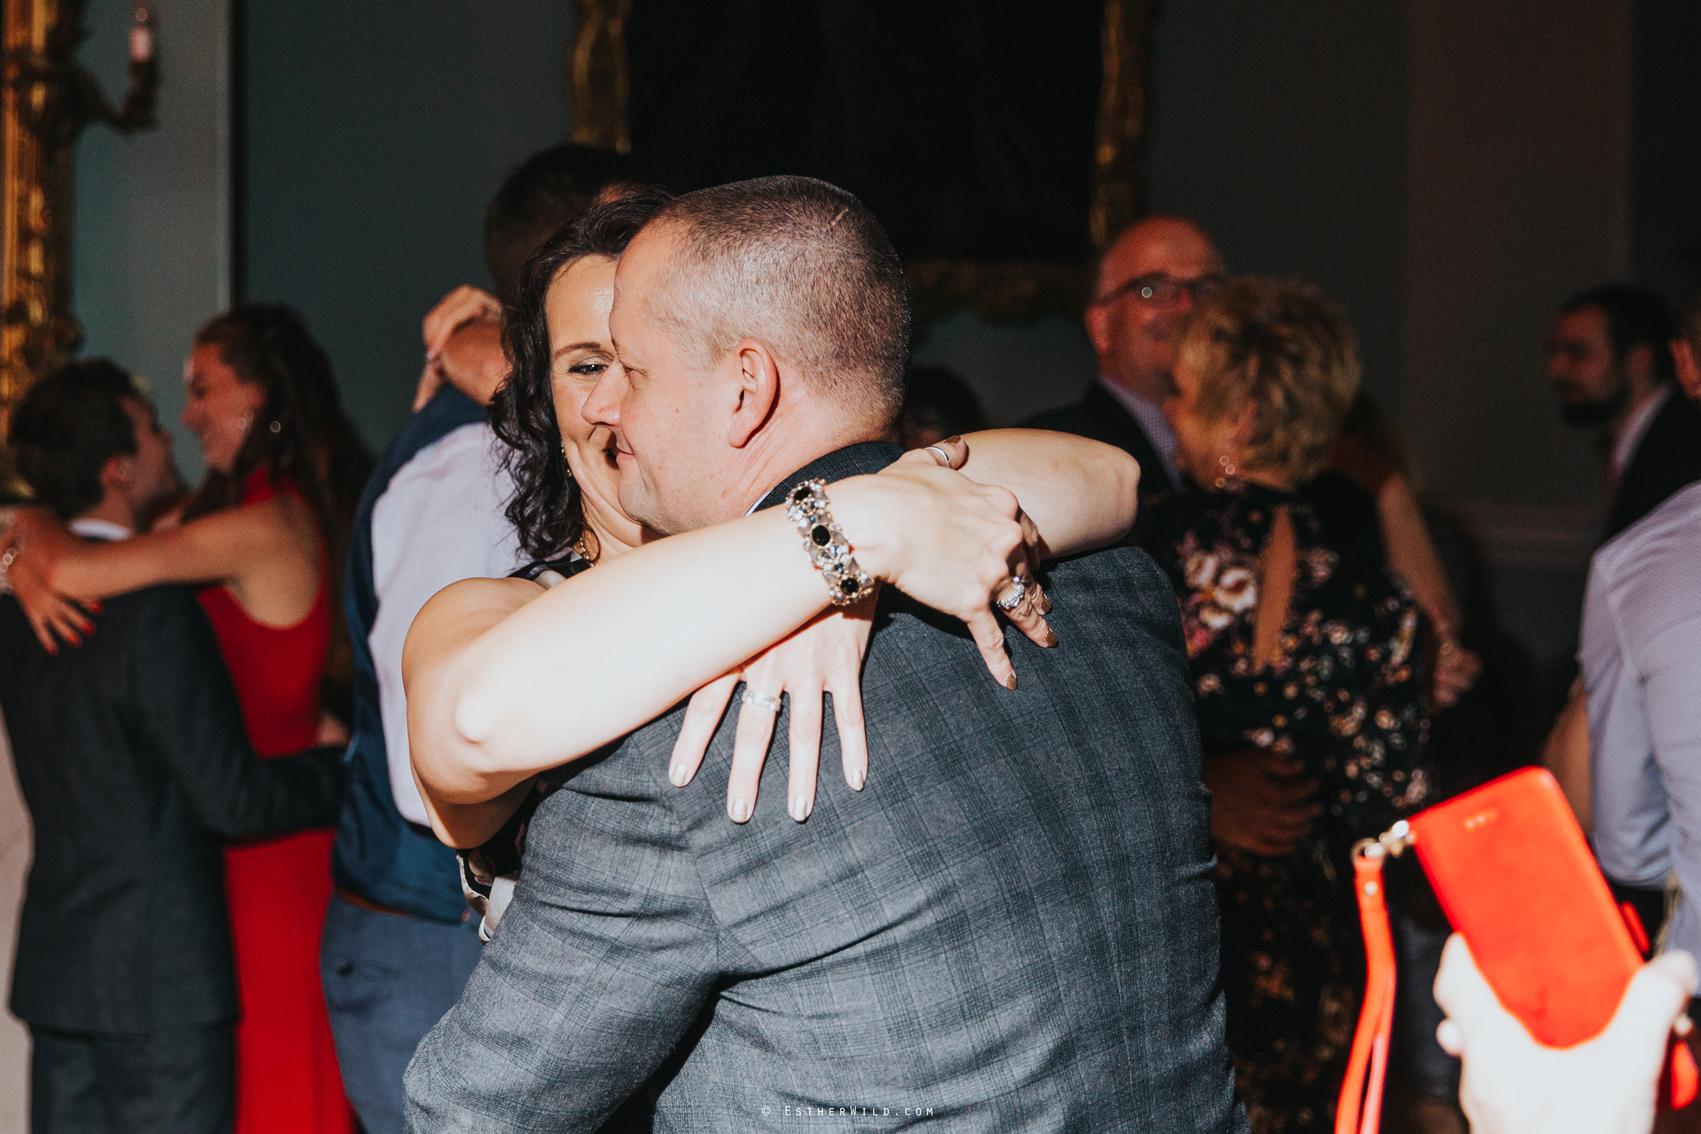 Wedding_Kings_Lynn_Town_Hall_Norfolk_Photographer_Esther_Wild_IMGL0862.jpg